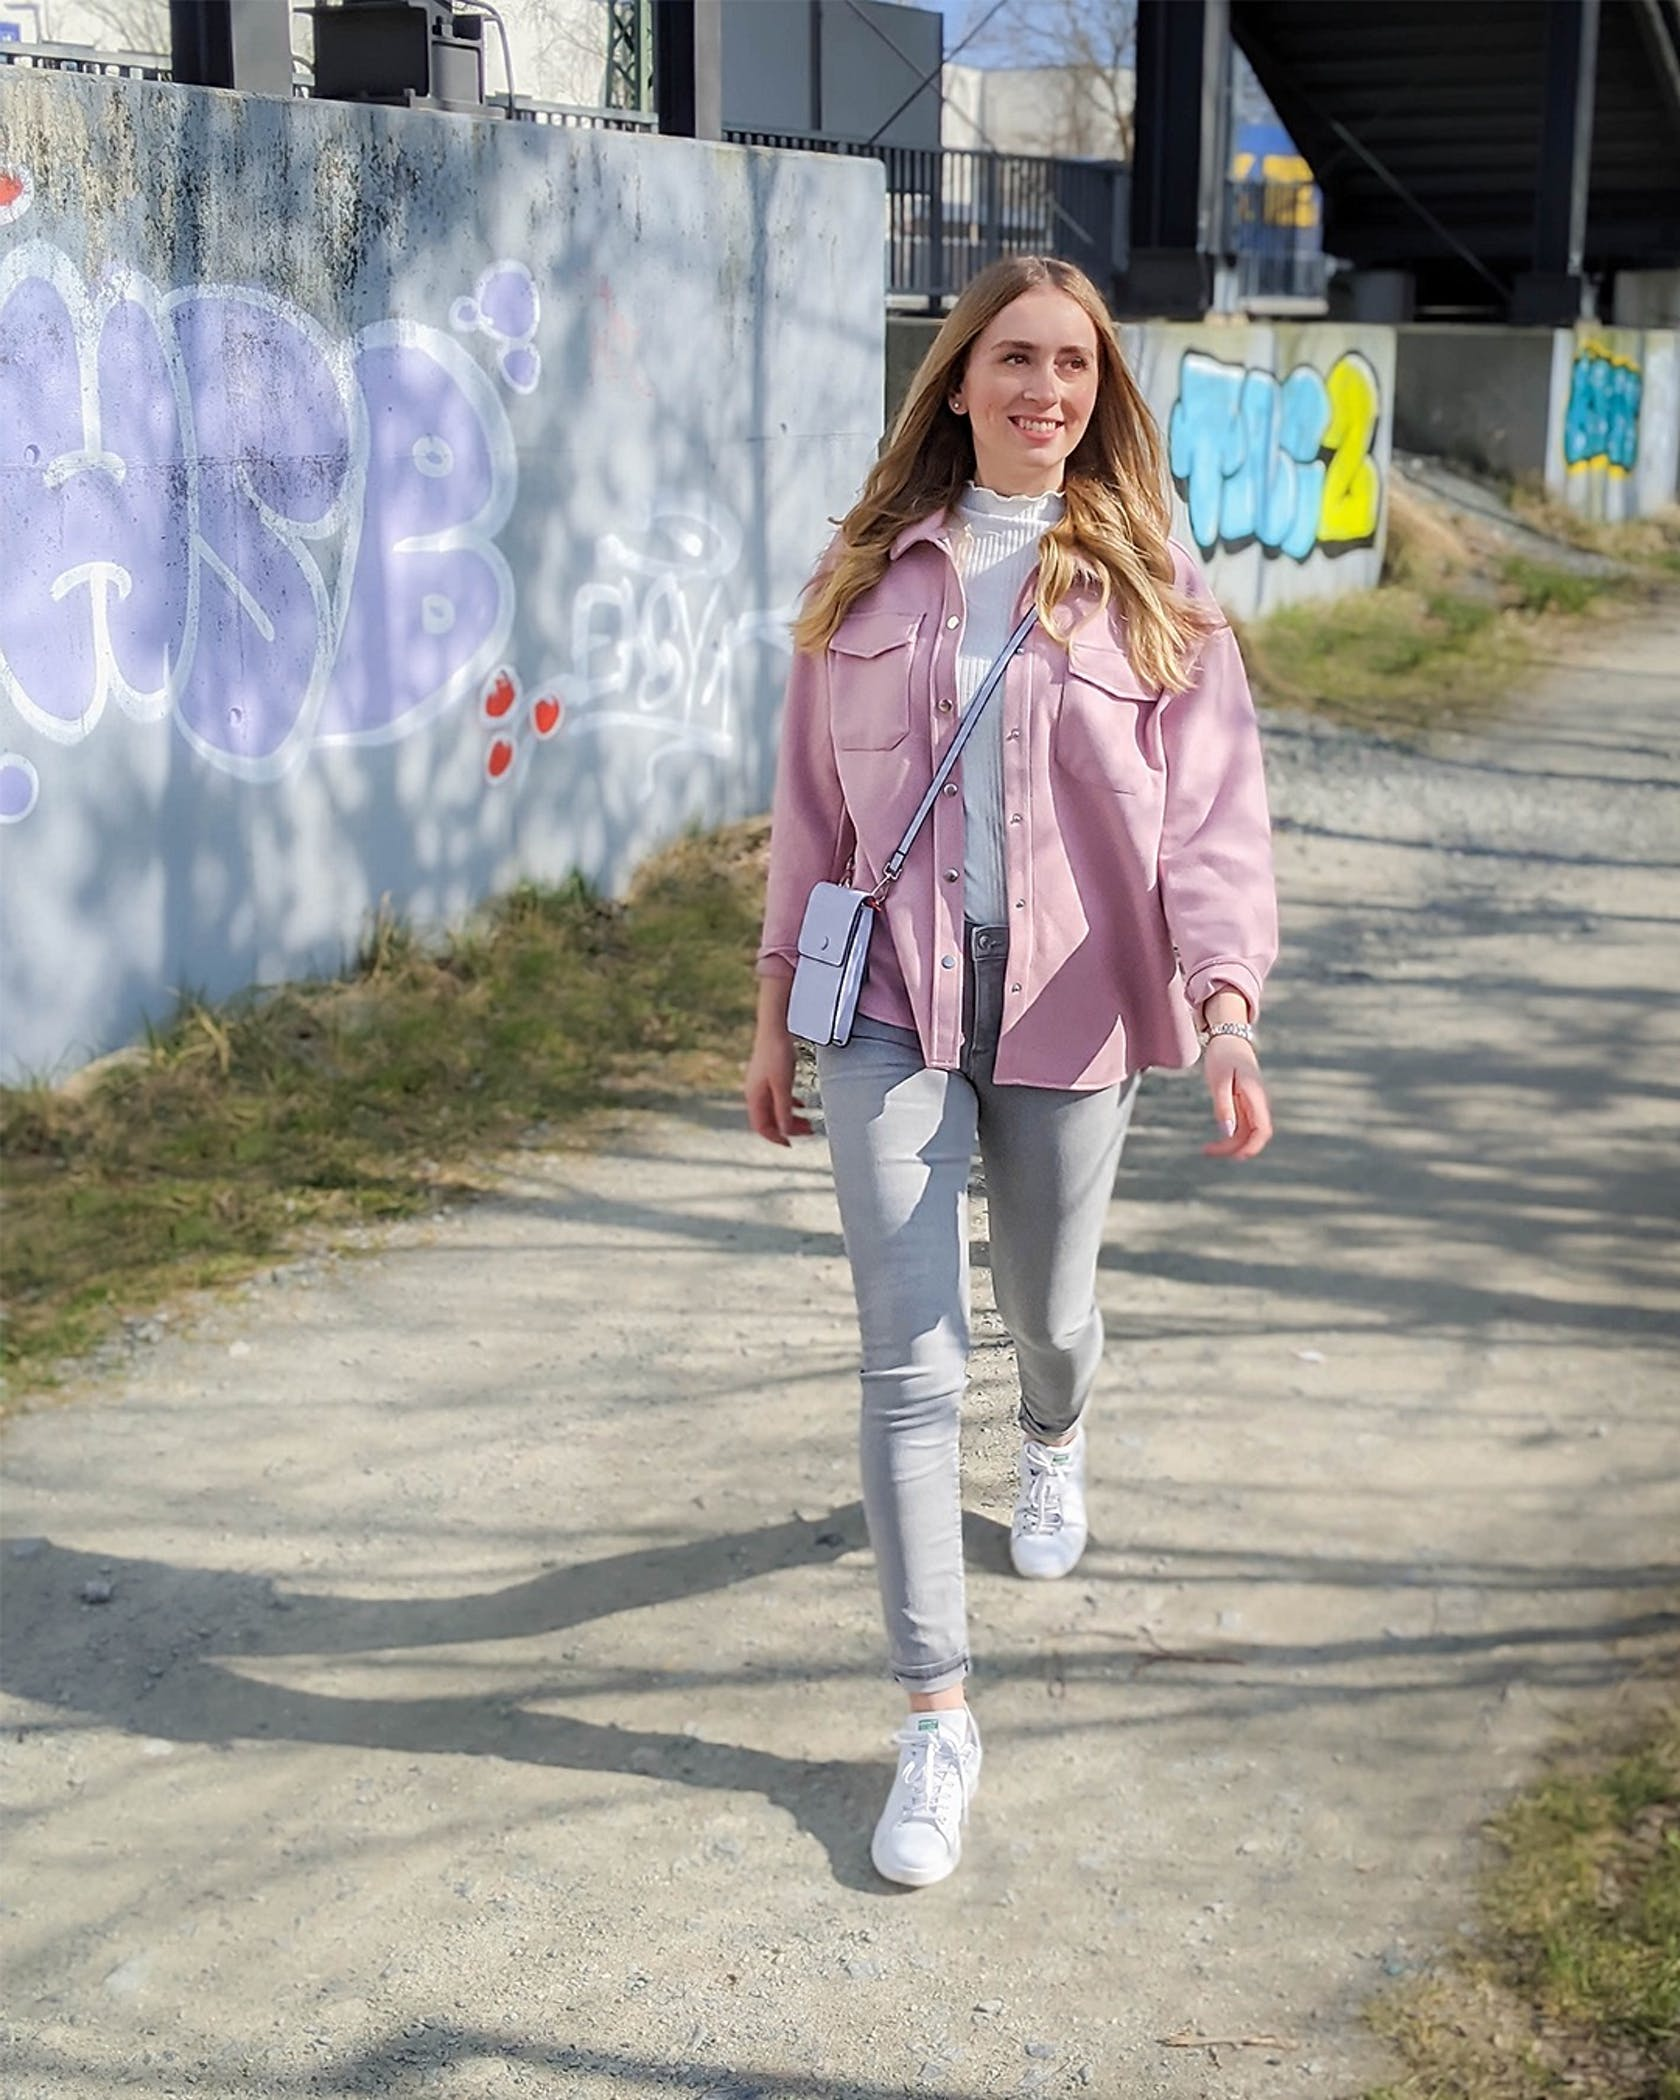 Model trägt im Frühjahr trendiges Outfit mit rosa XXL-Jacke